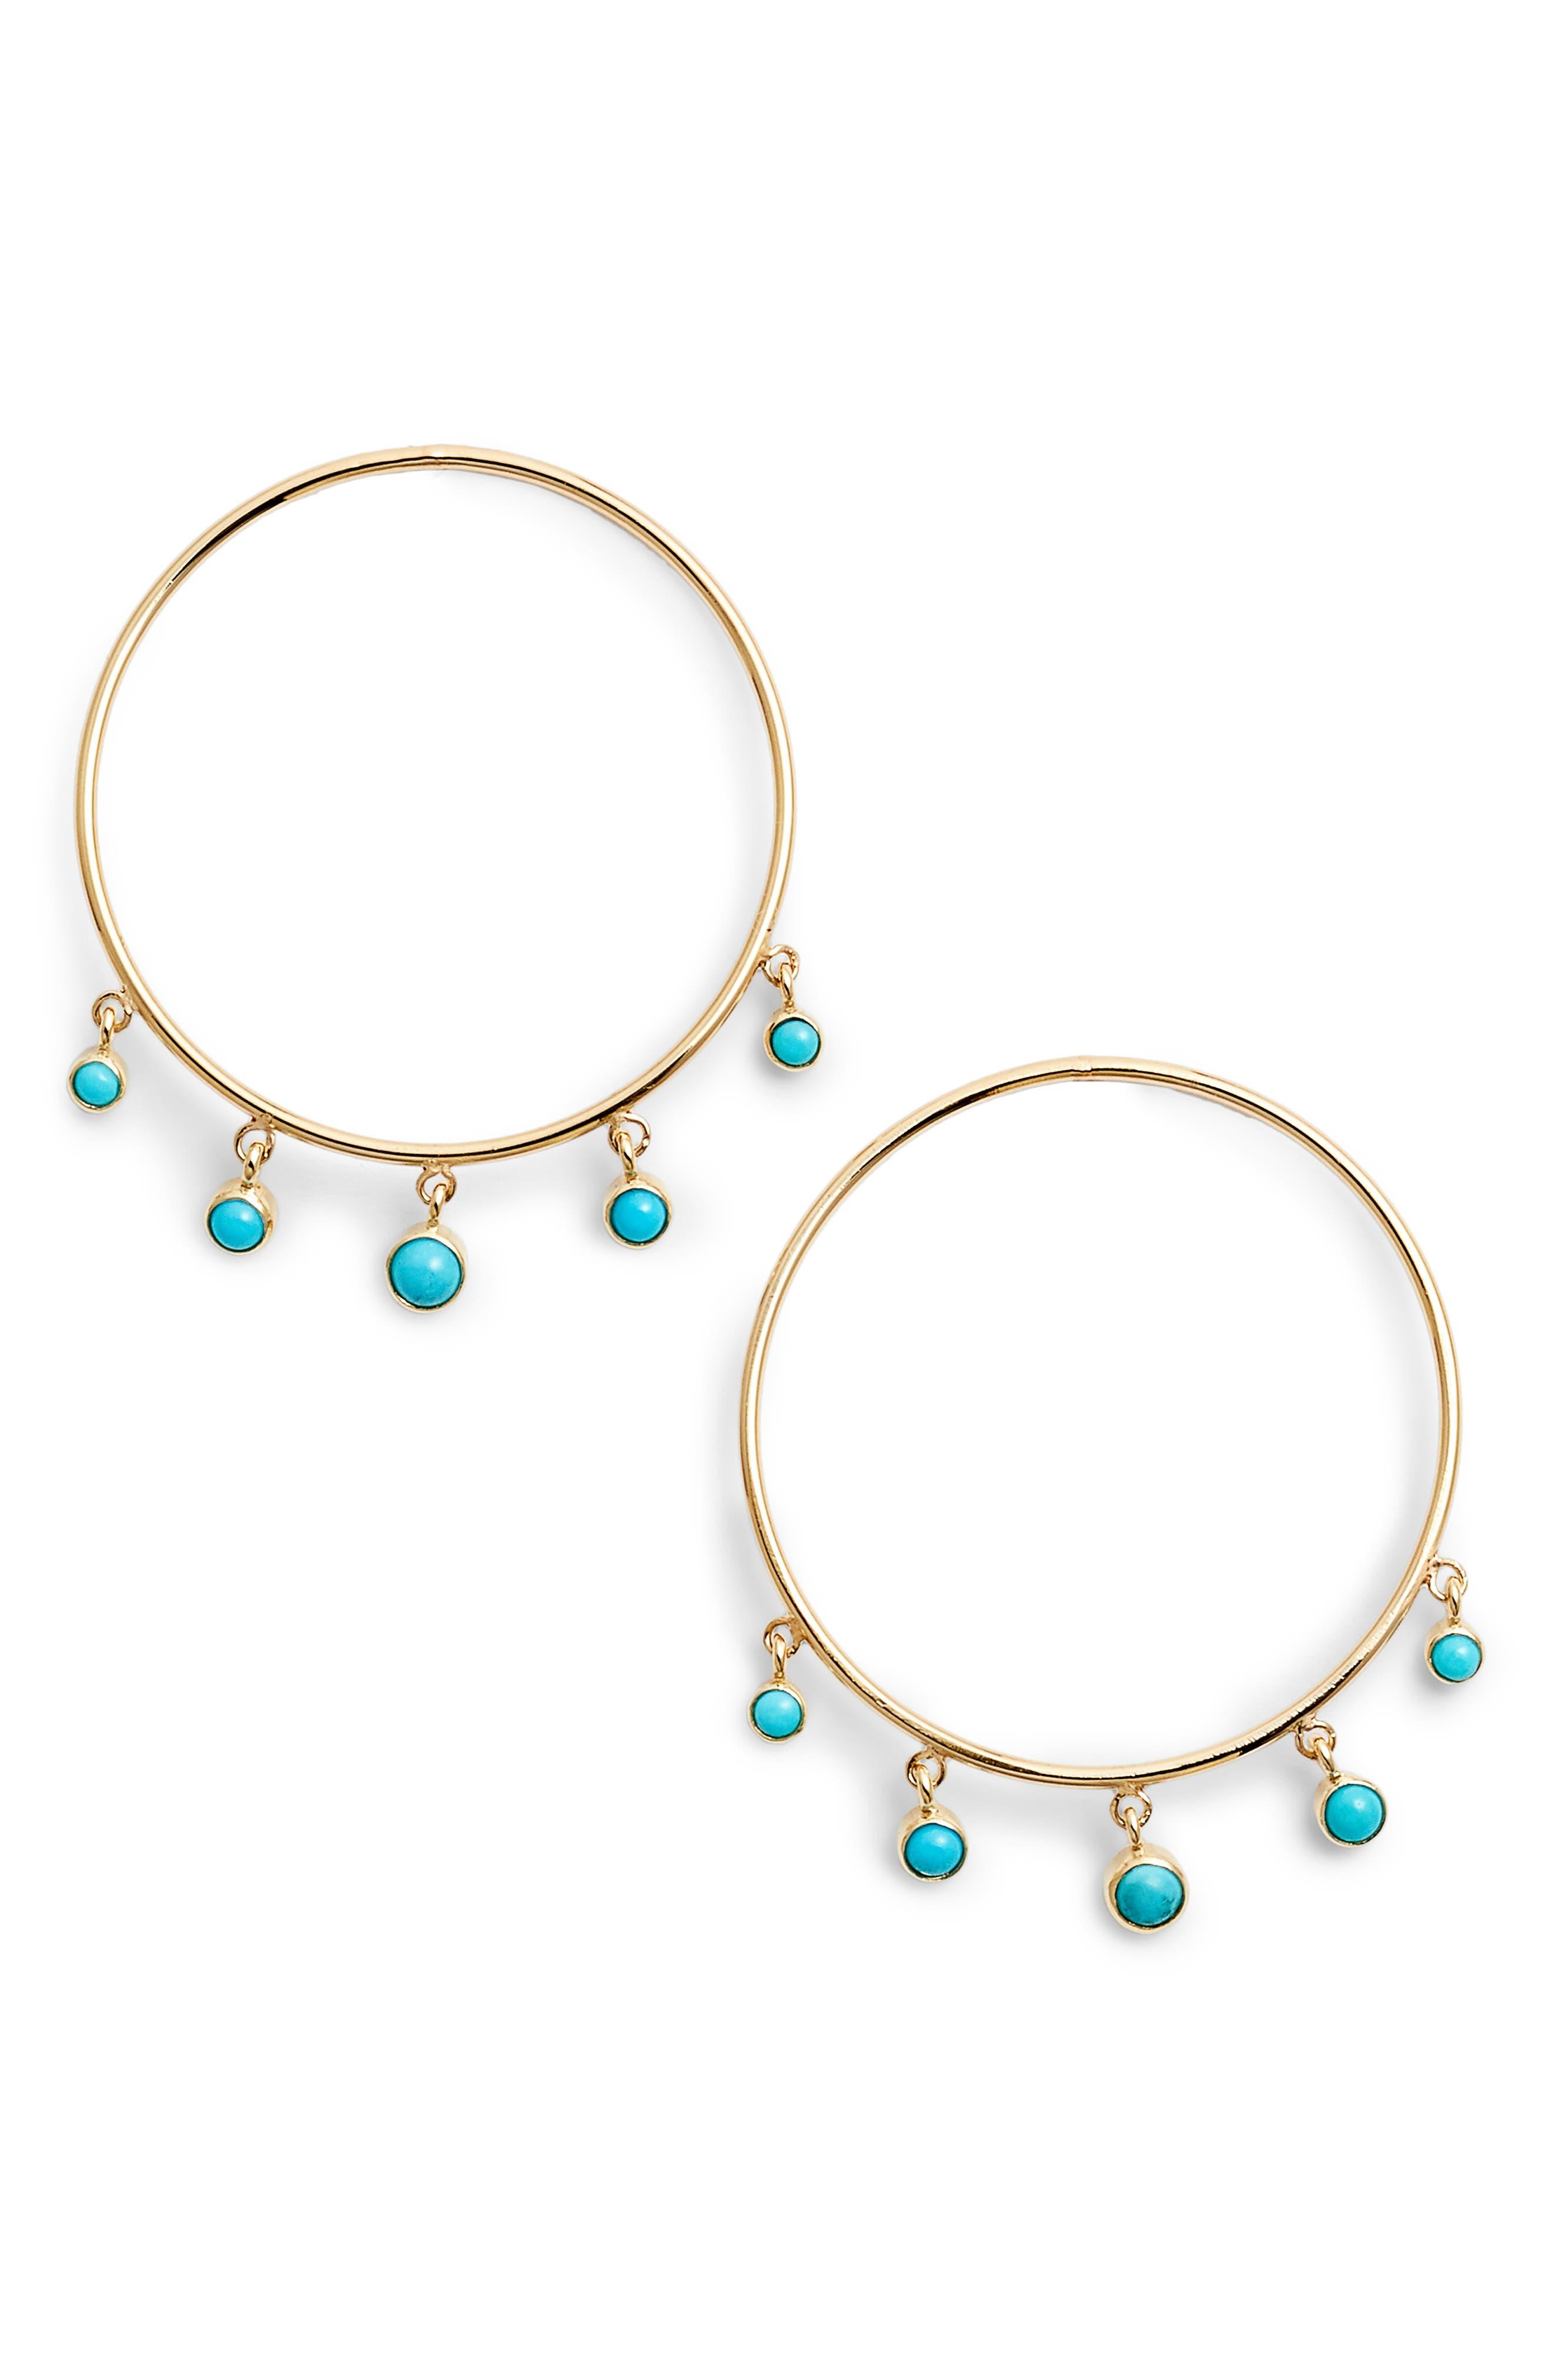 Zoe Chicco Dangling Turquoise Hoop Earrings,                             Main thumbnail 1, color,                             Yellow Gold